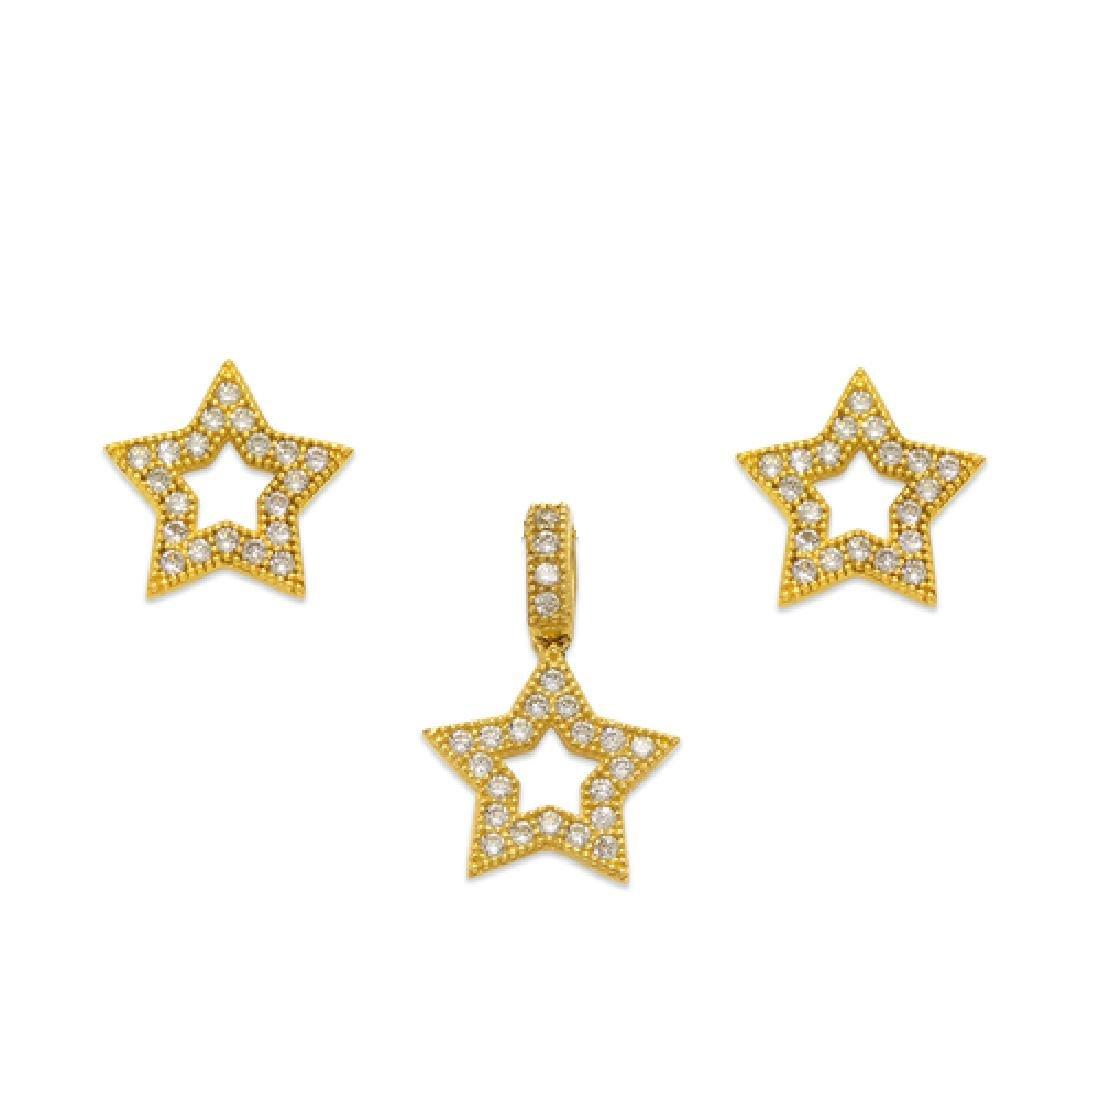 NEW 14K YELLOW GOLD STAR EARRING PENDANT SET